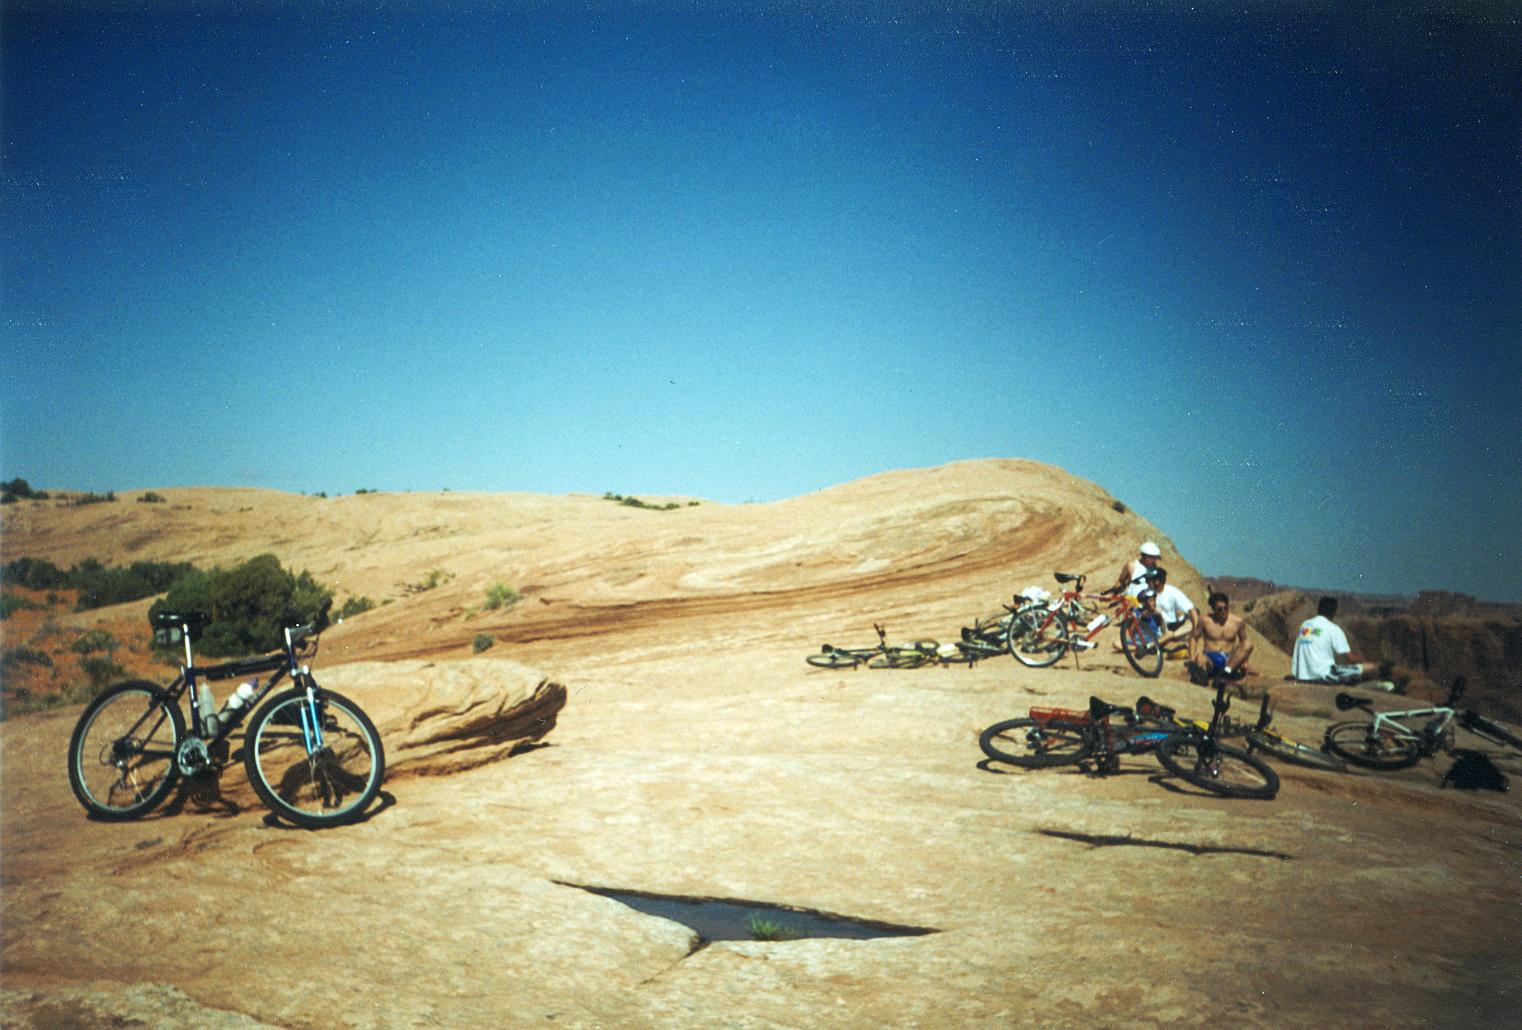 19940514-moab-slickrocktrail02